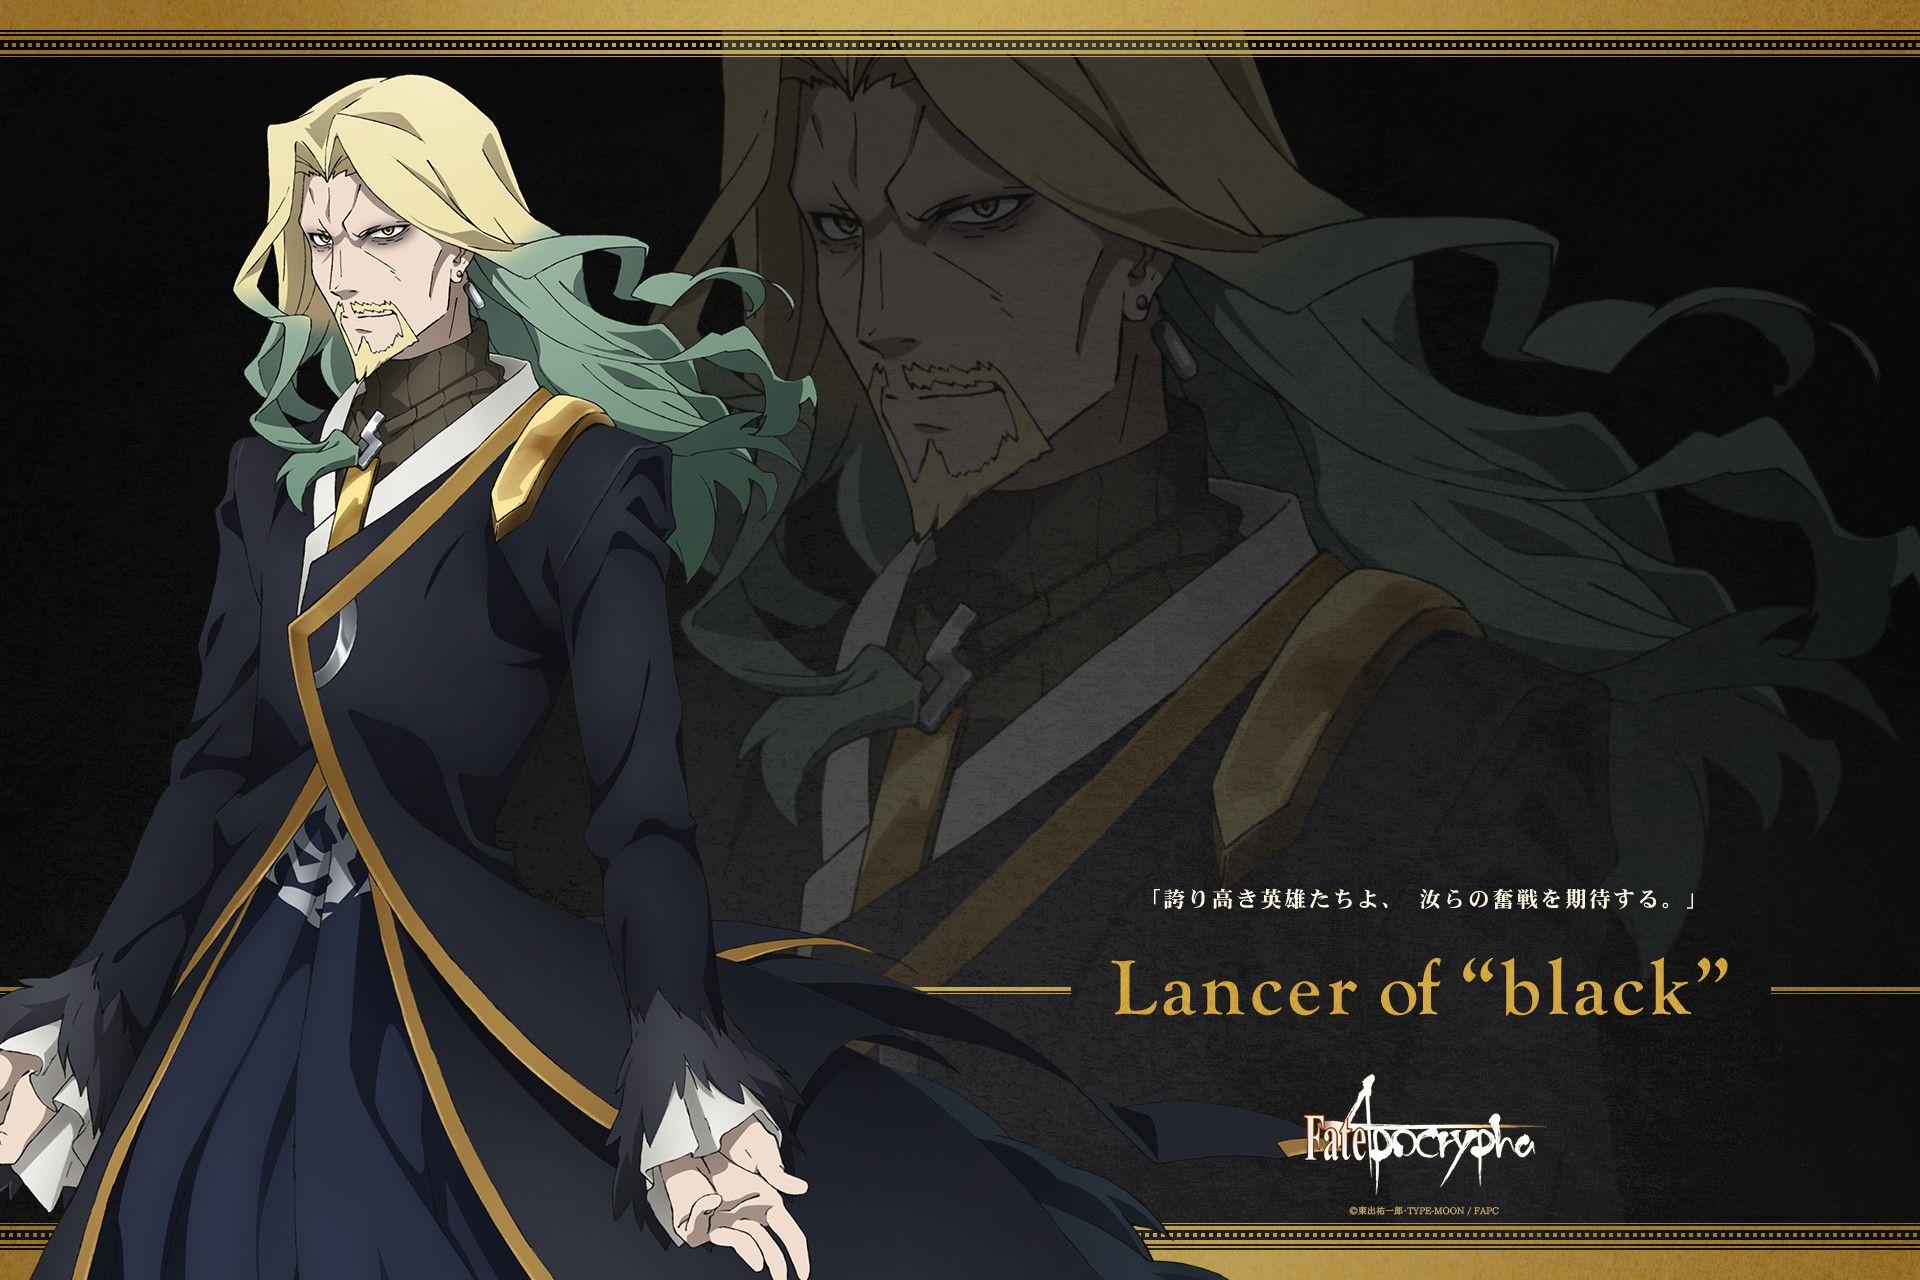 Lancer Of Black Fate Apocrypha Fate Apocrypha Wallpaper